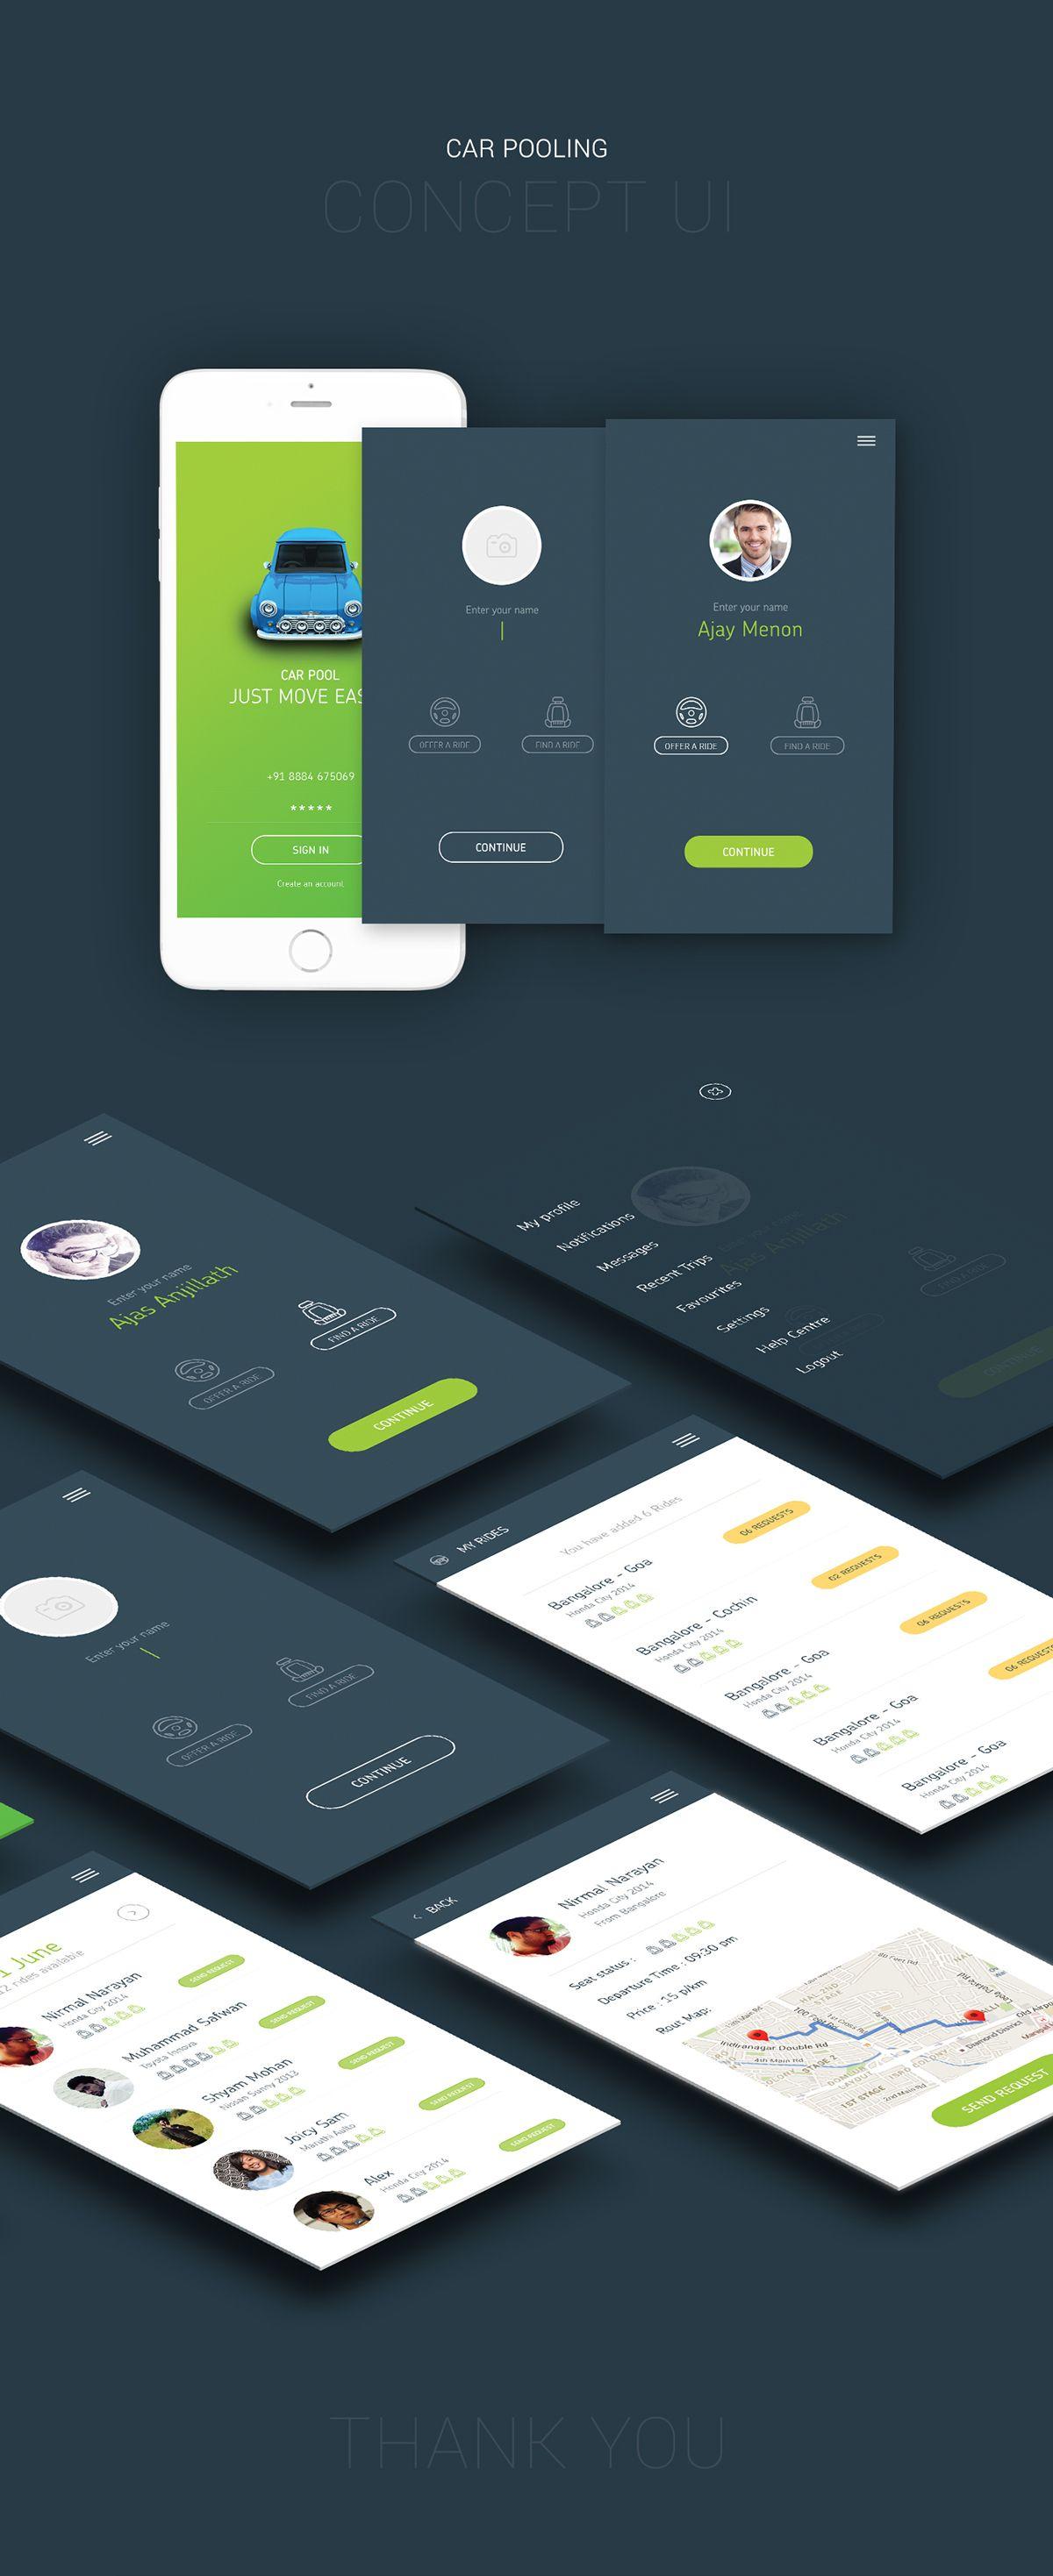 Car Pooling App Concept Ui On Behance 1 Ui App Covers Car